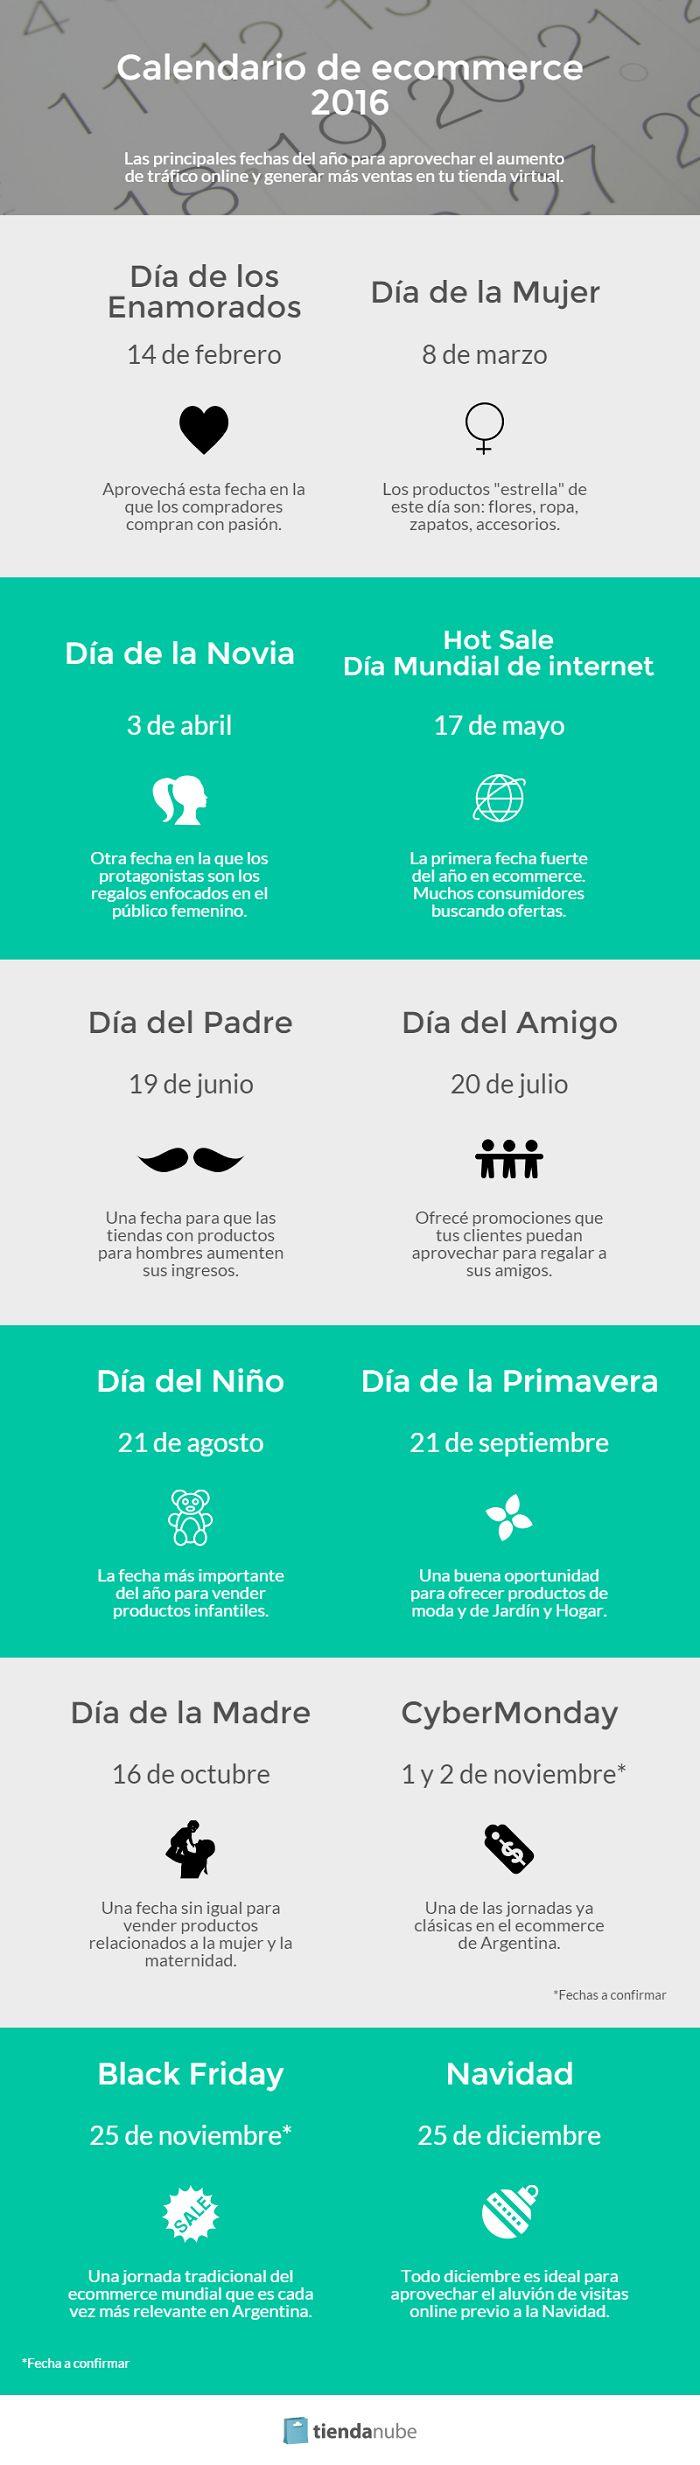 Fechas para ecommerce 2016 Argentina